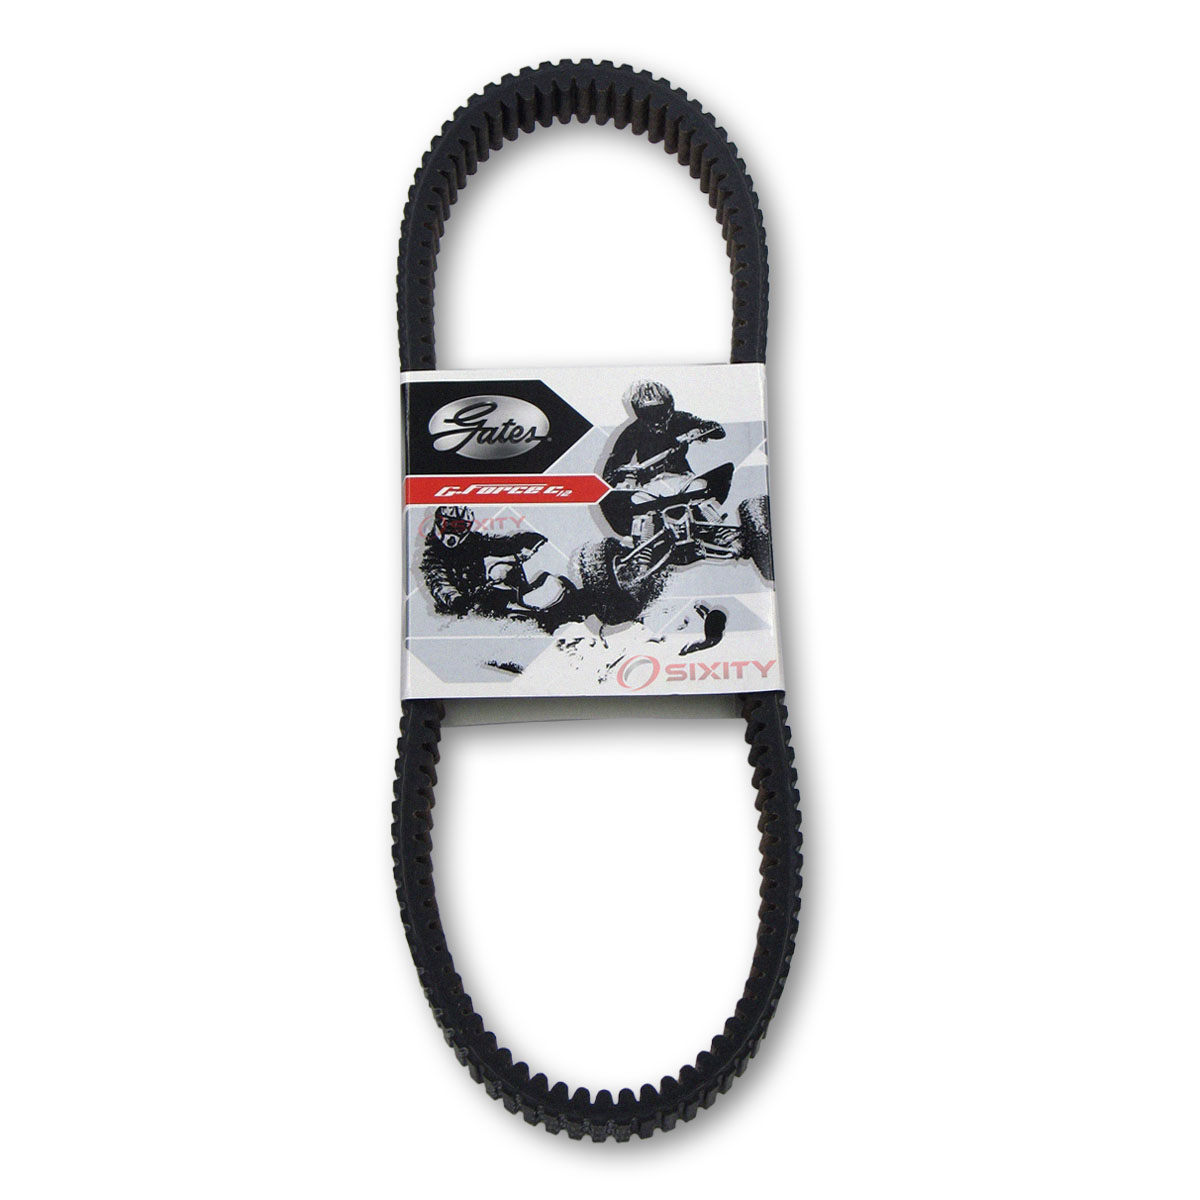 Gates 39C4455 G-Force C12 Snowmobile Drive Belt 0627-046 0627-060 0627-067 ku